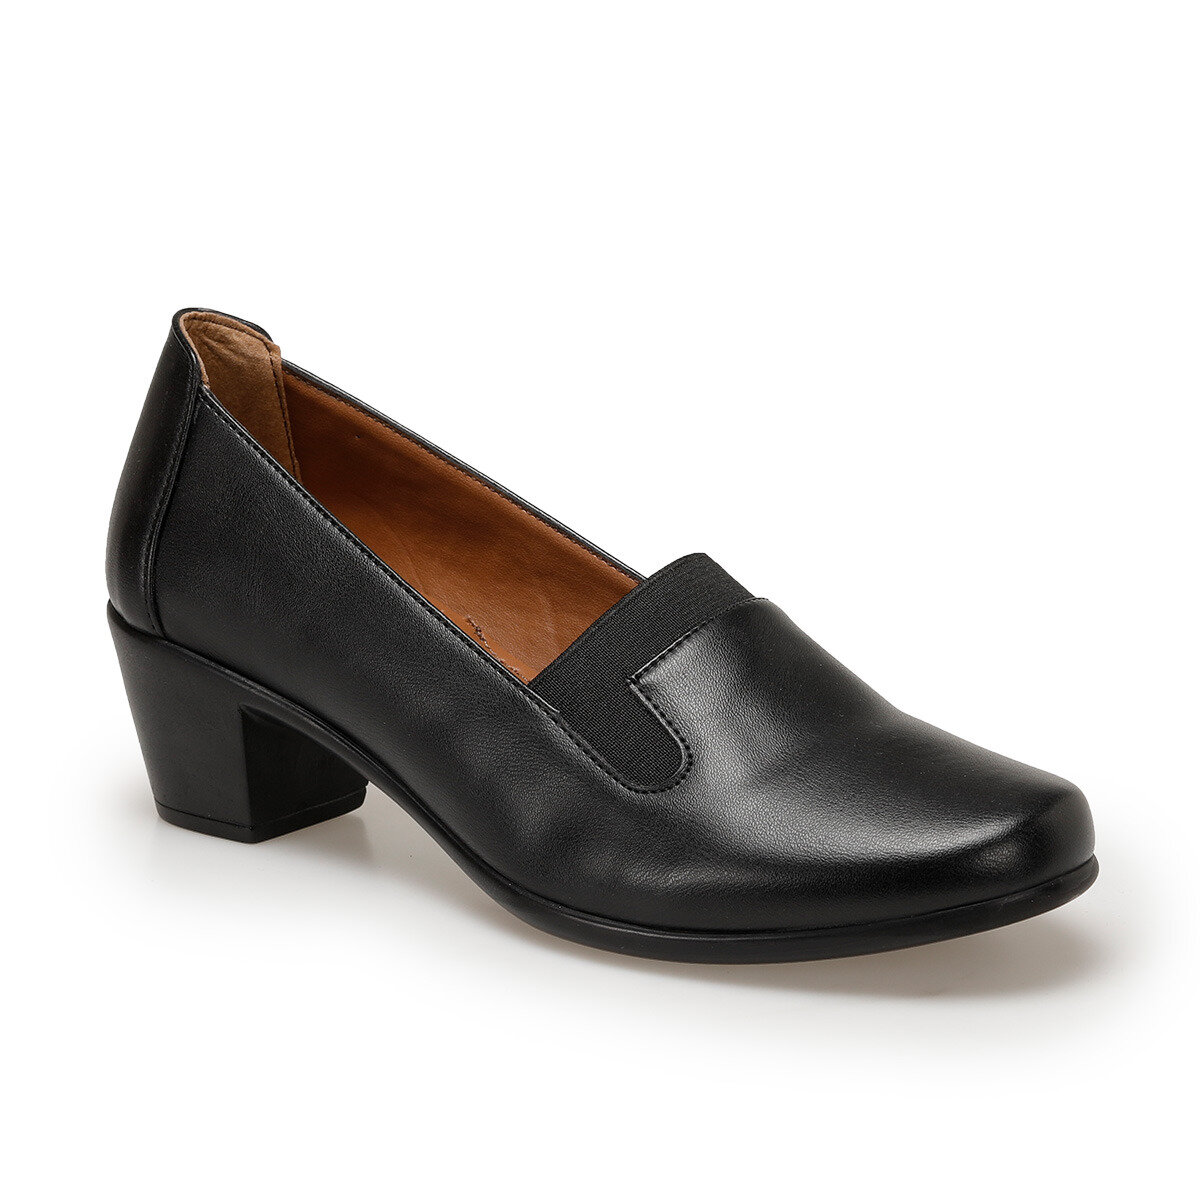 FLO 161019.Z Black Women Shoes Polaris